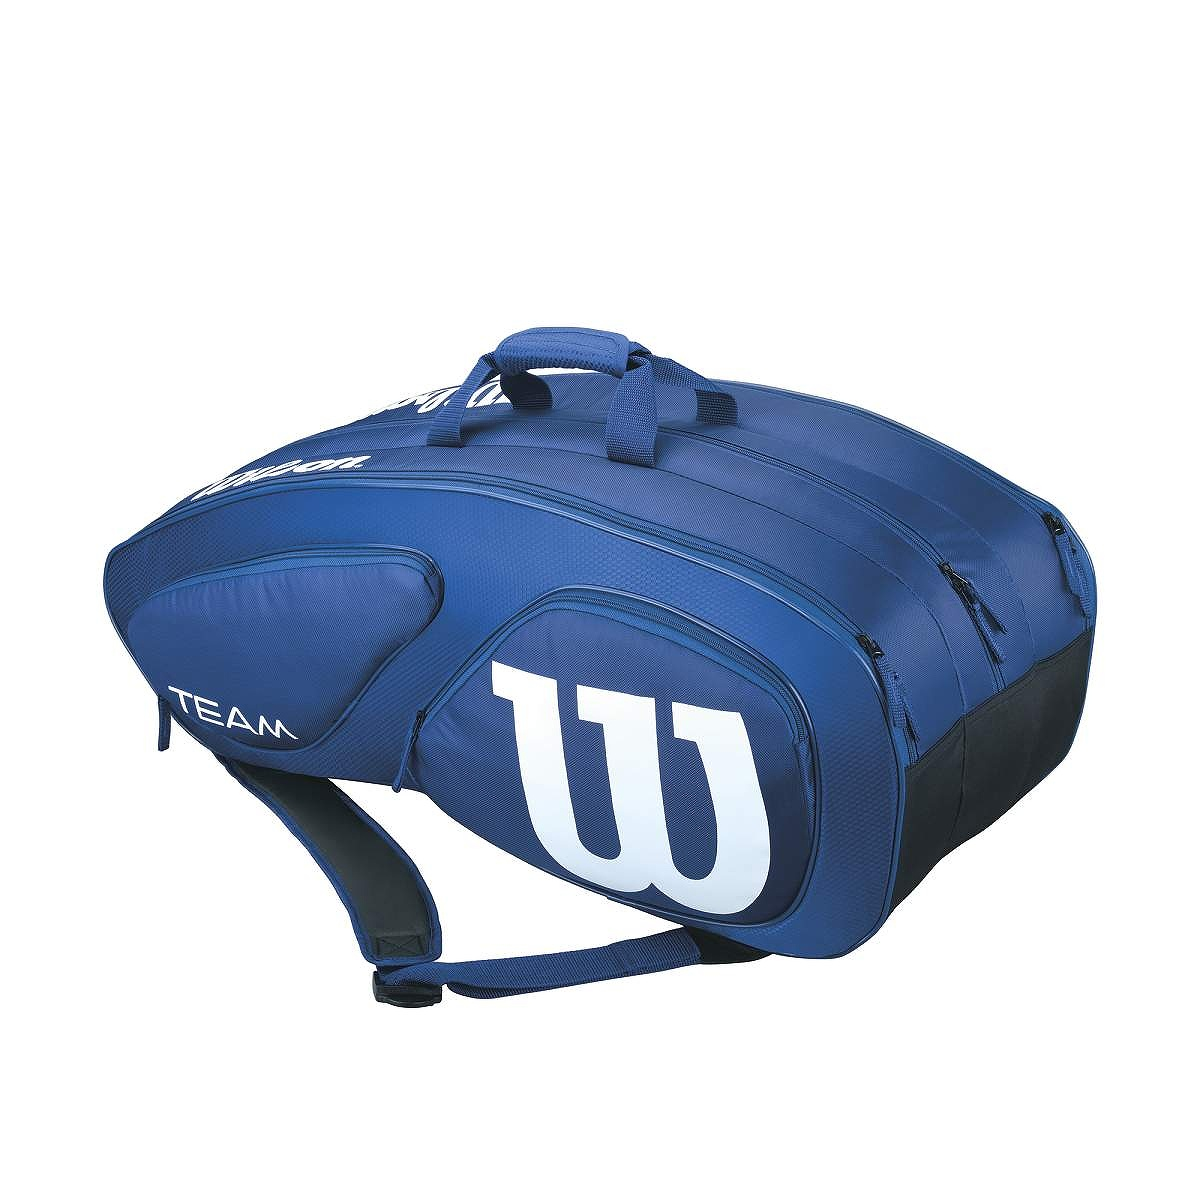 Wilson Team Navy 12 pack